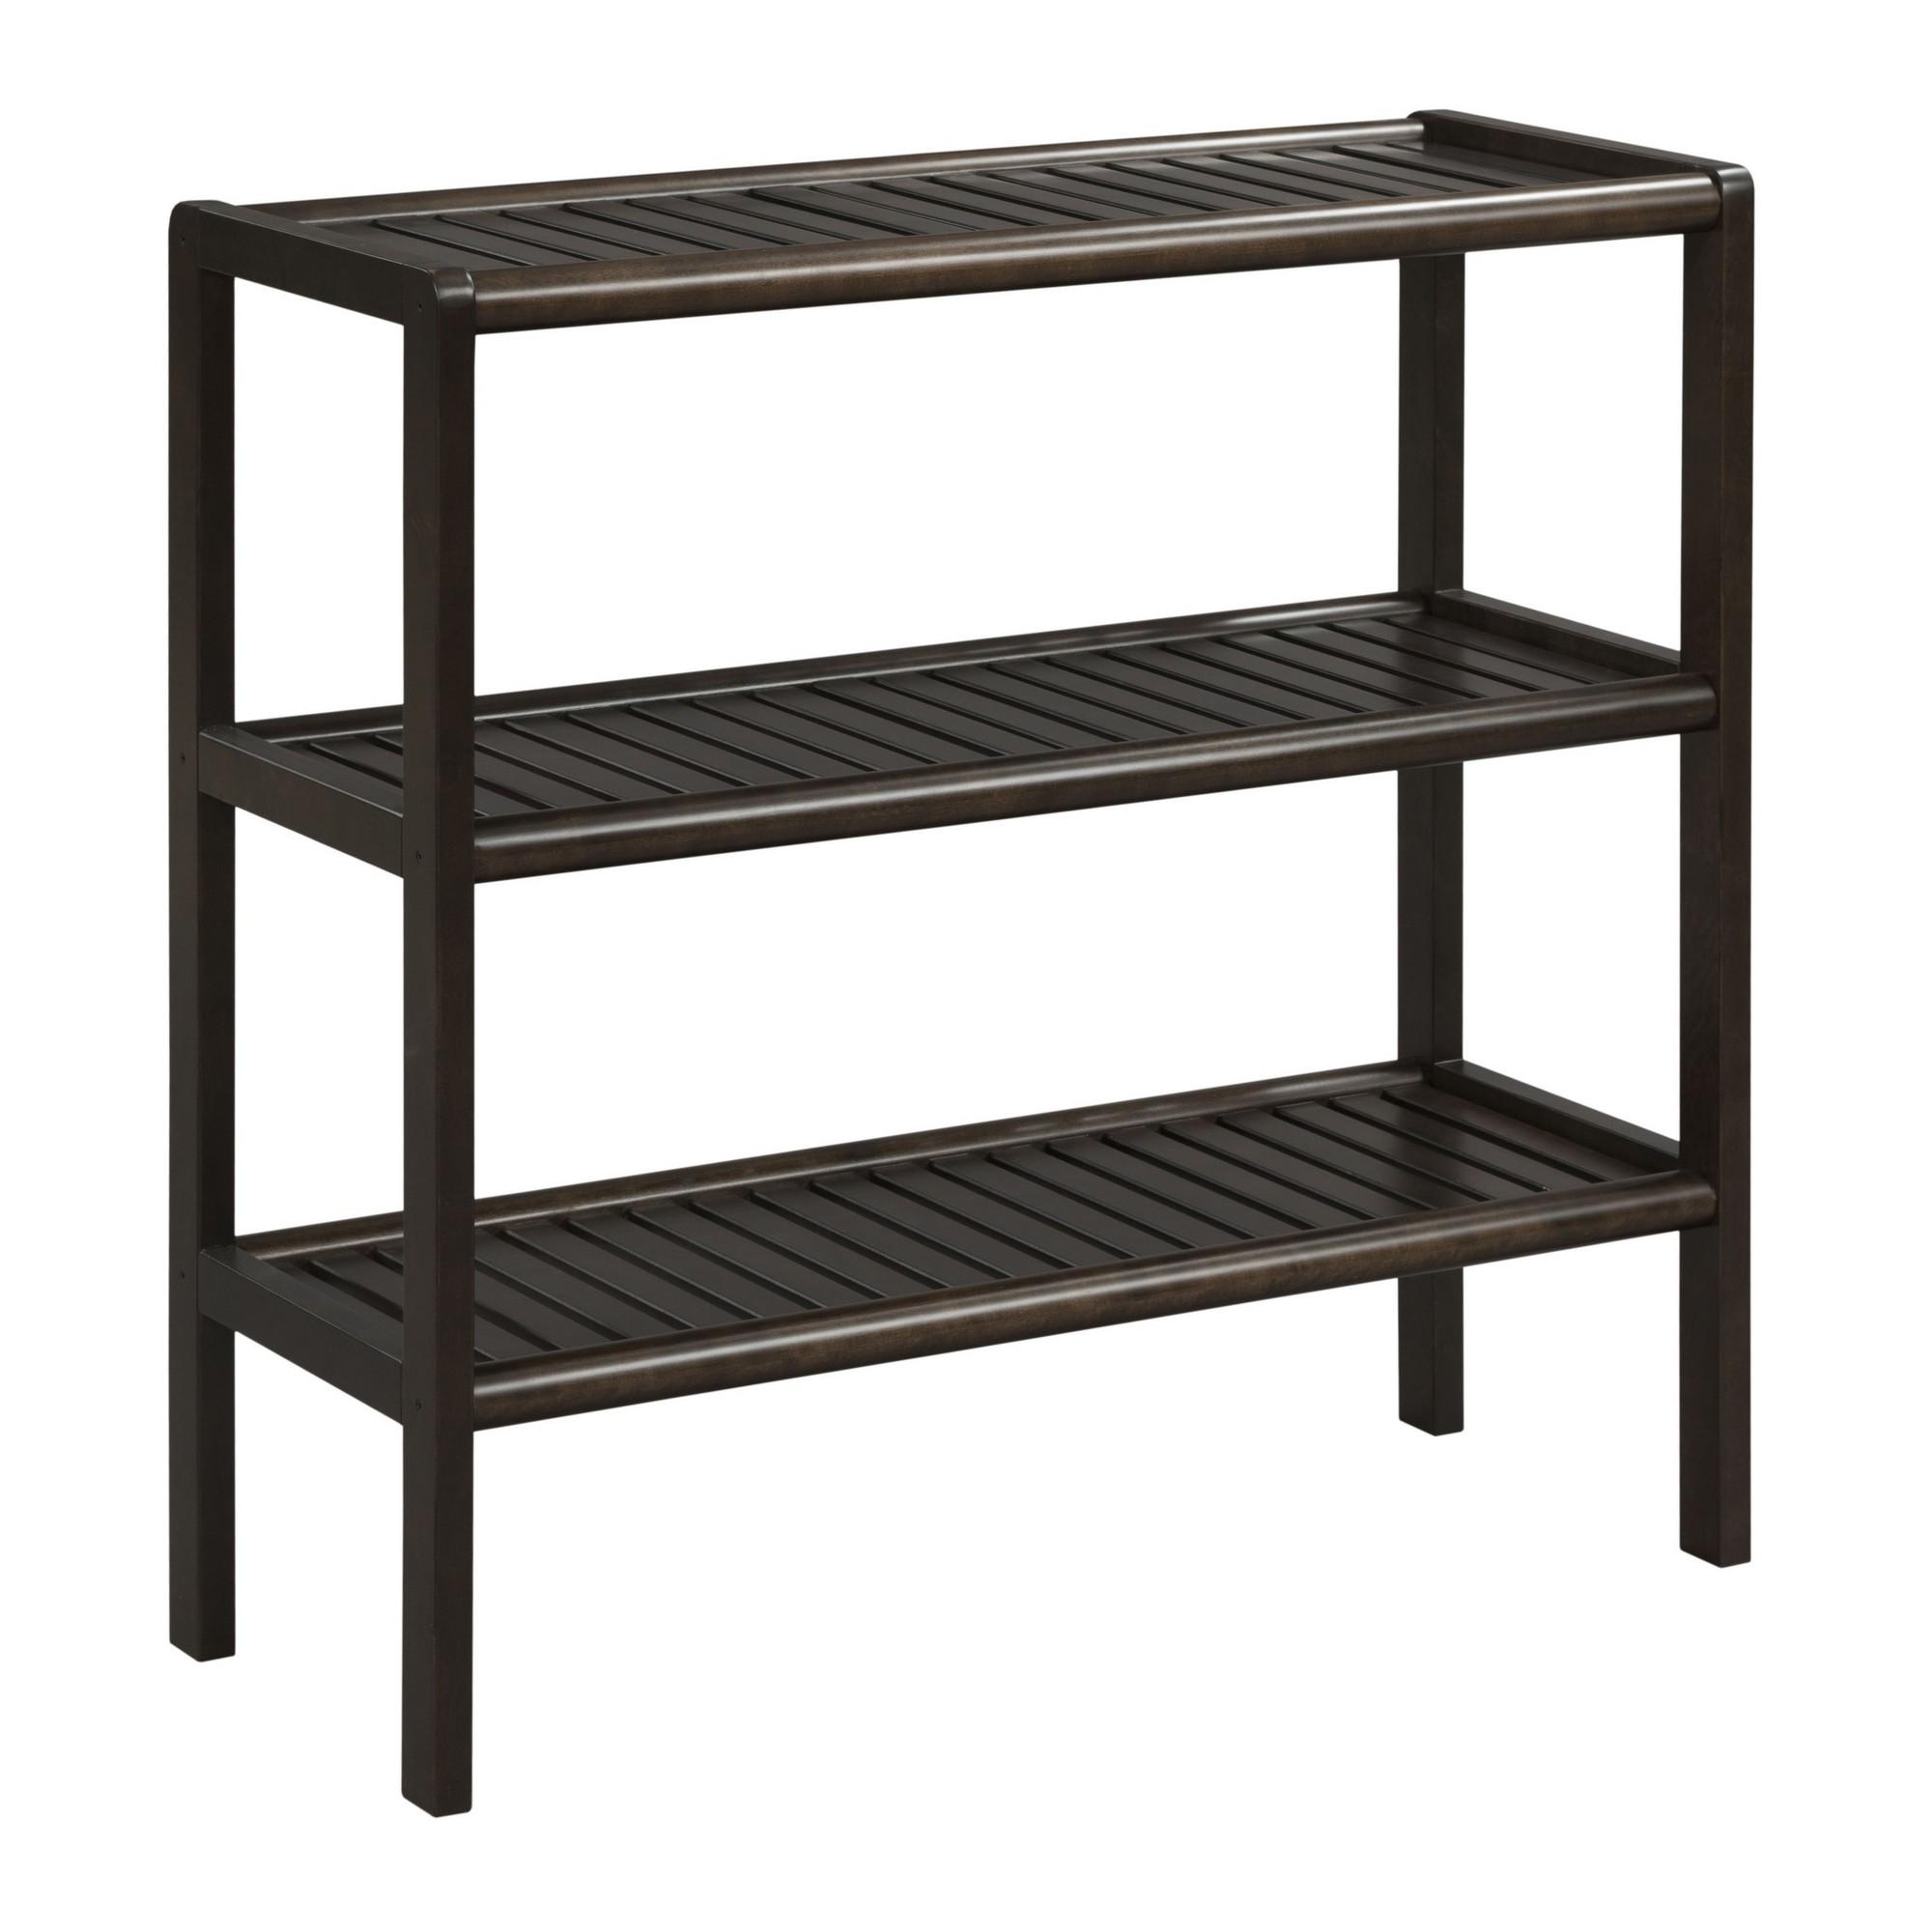 "30"" Bookcase with 3 Shelves in Espresso"